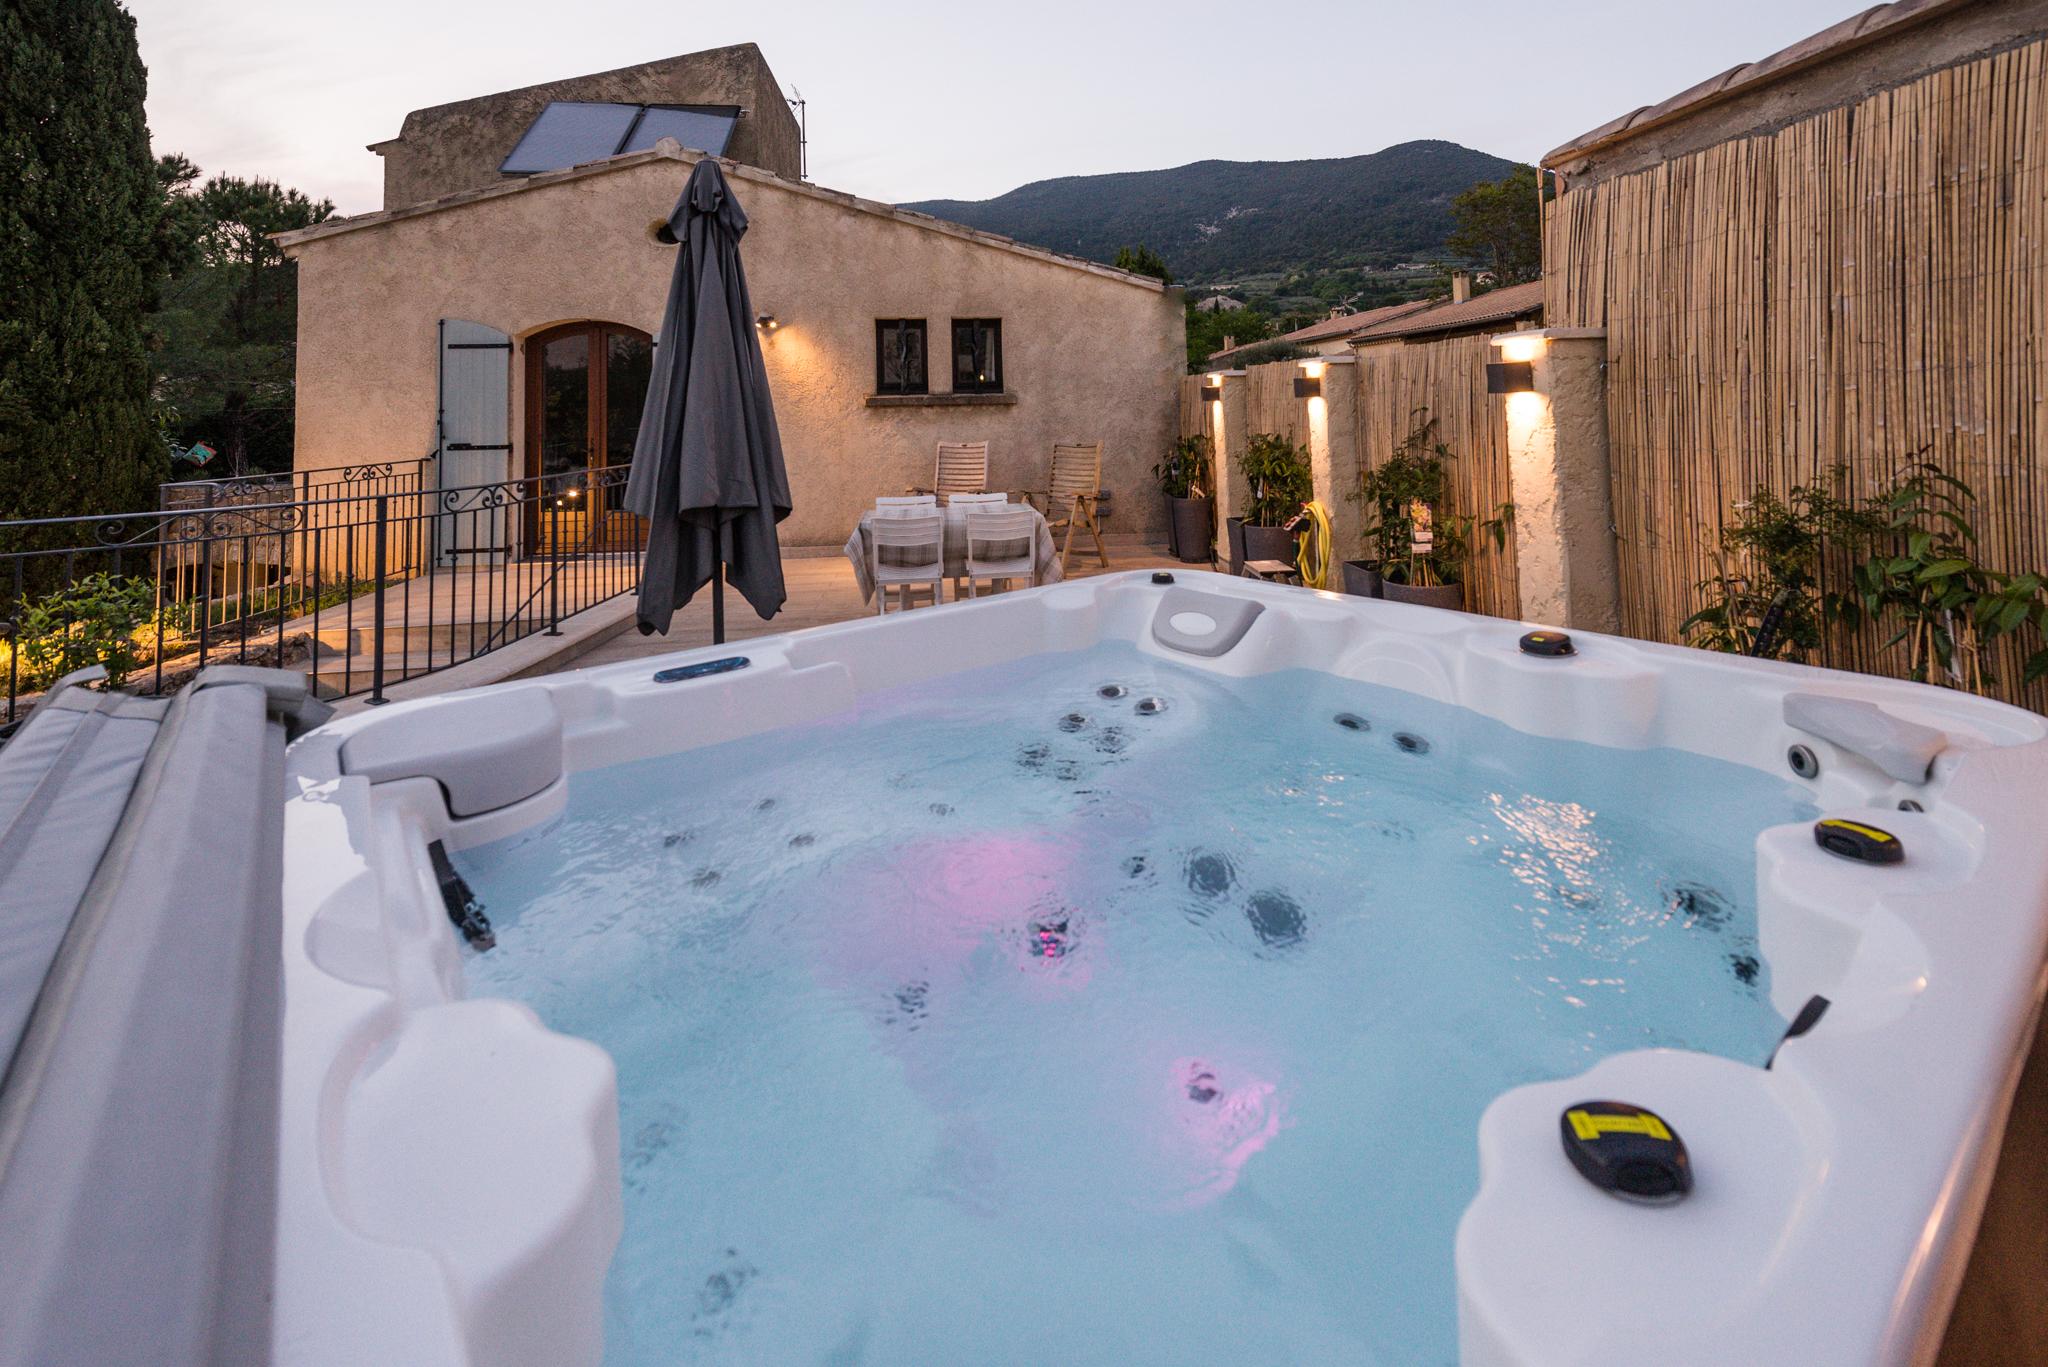 feriebolig-frankrig-sauna-pool-DSC_4757.jpg